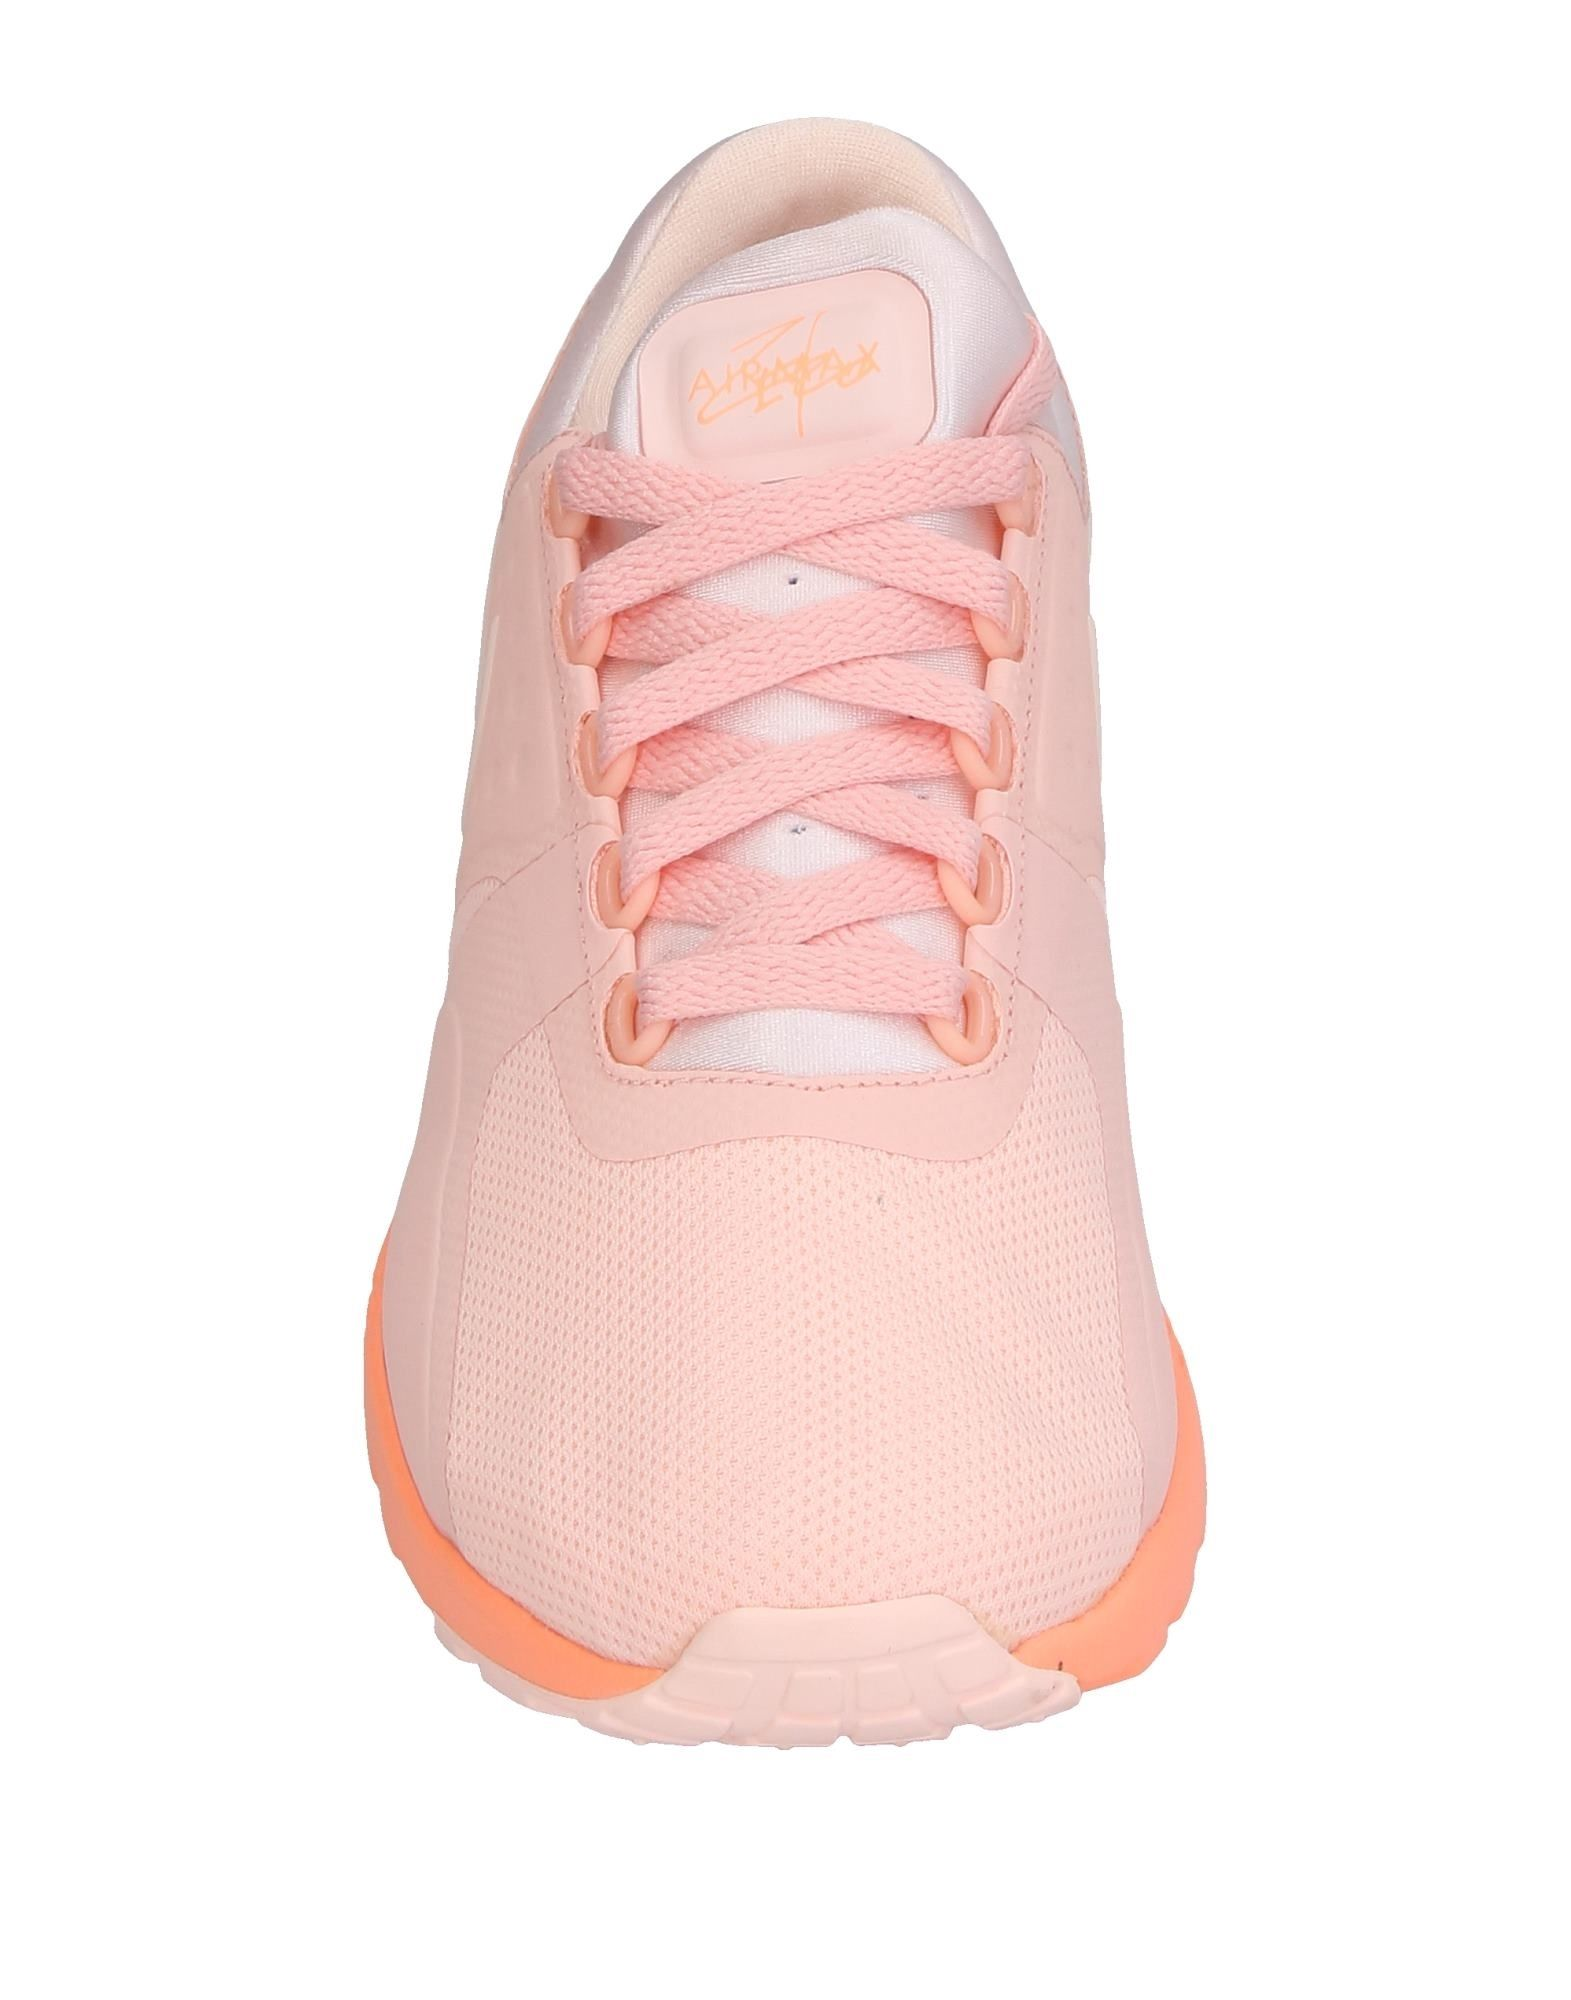 Sneakers Nike  Air Max Zero - Femme - Sneakers Nike sur